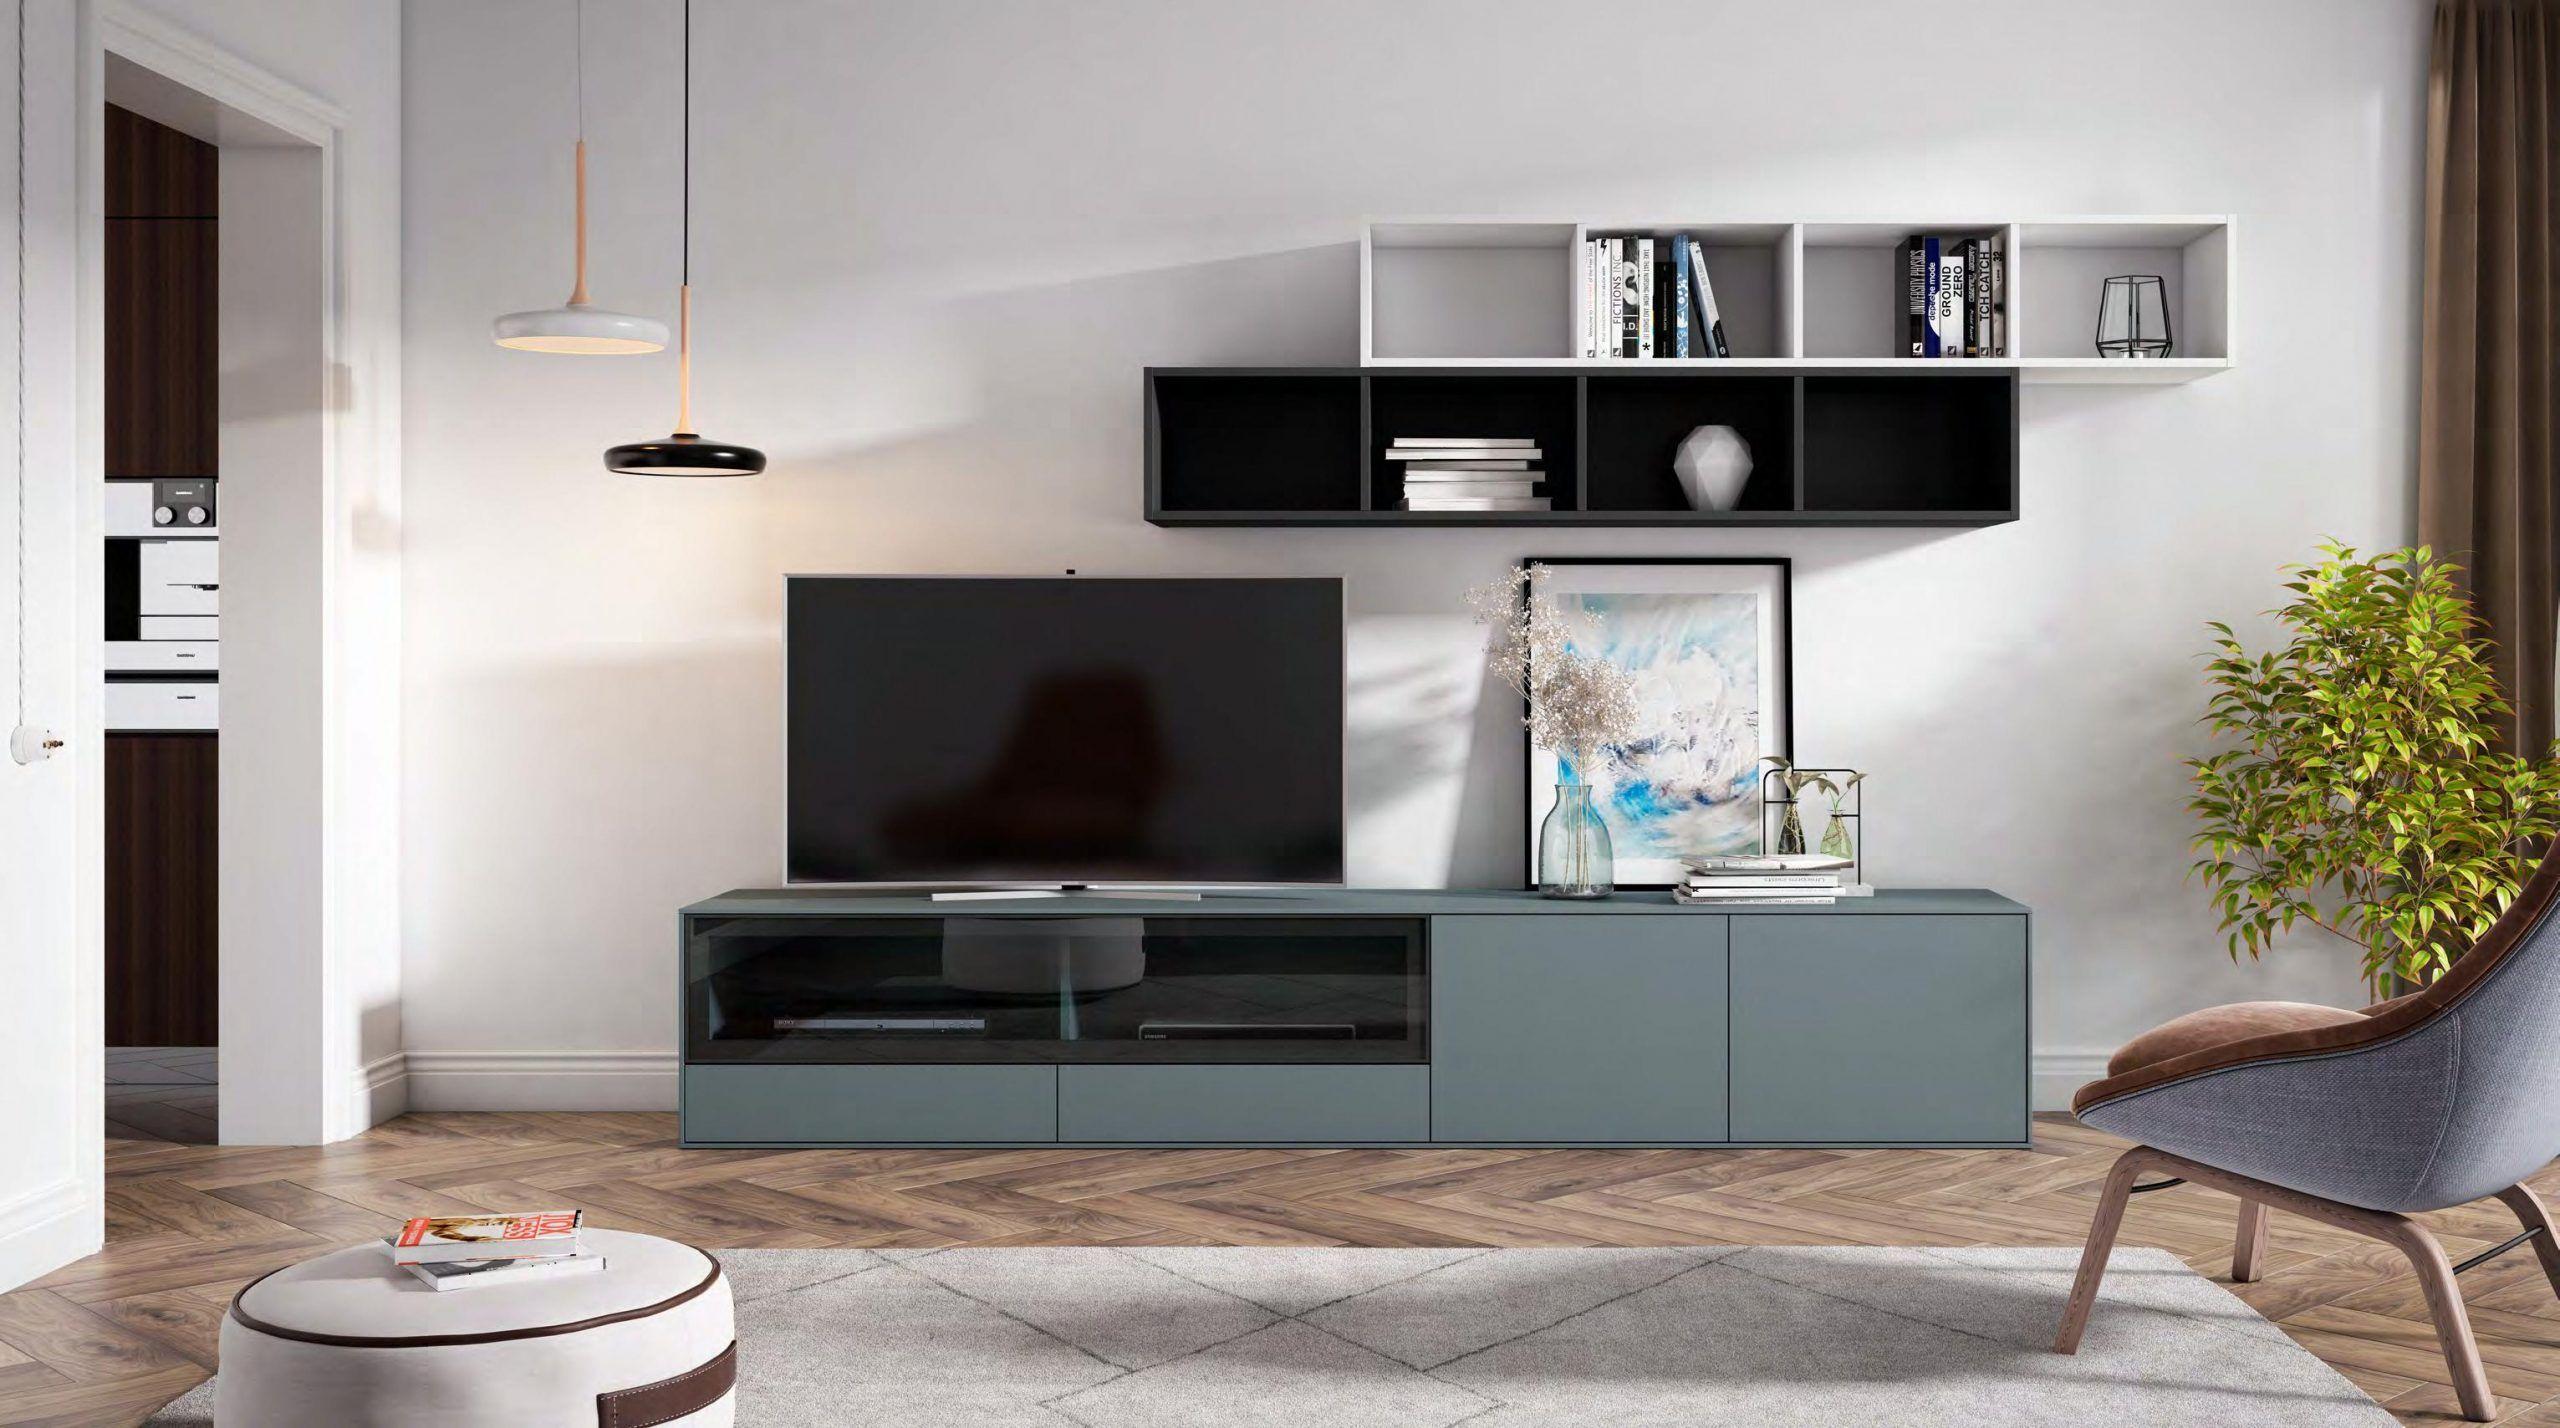 Aprende a decorar un salón moderno minimalista en 5 pasos